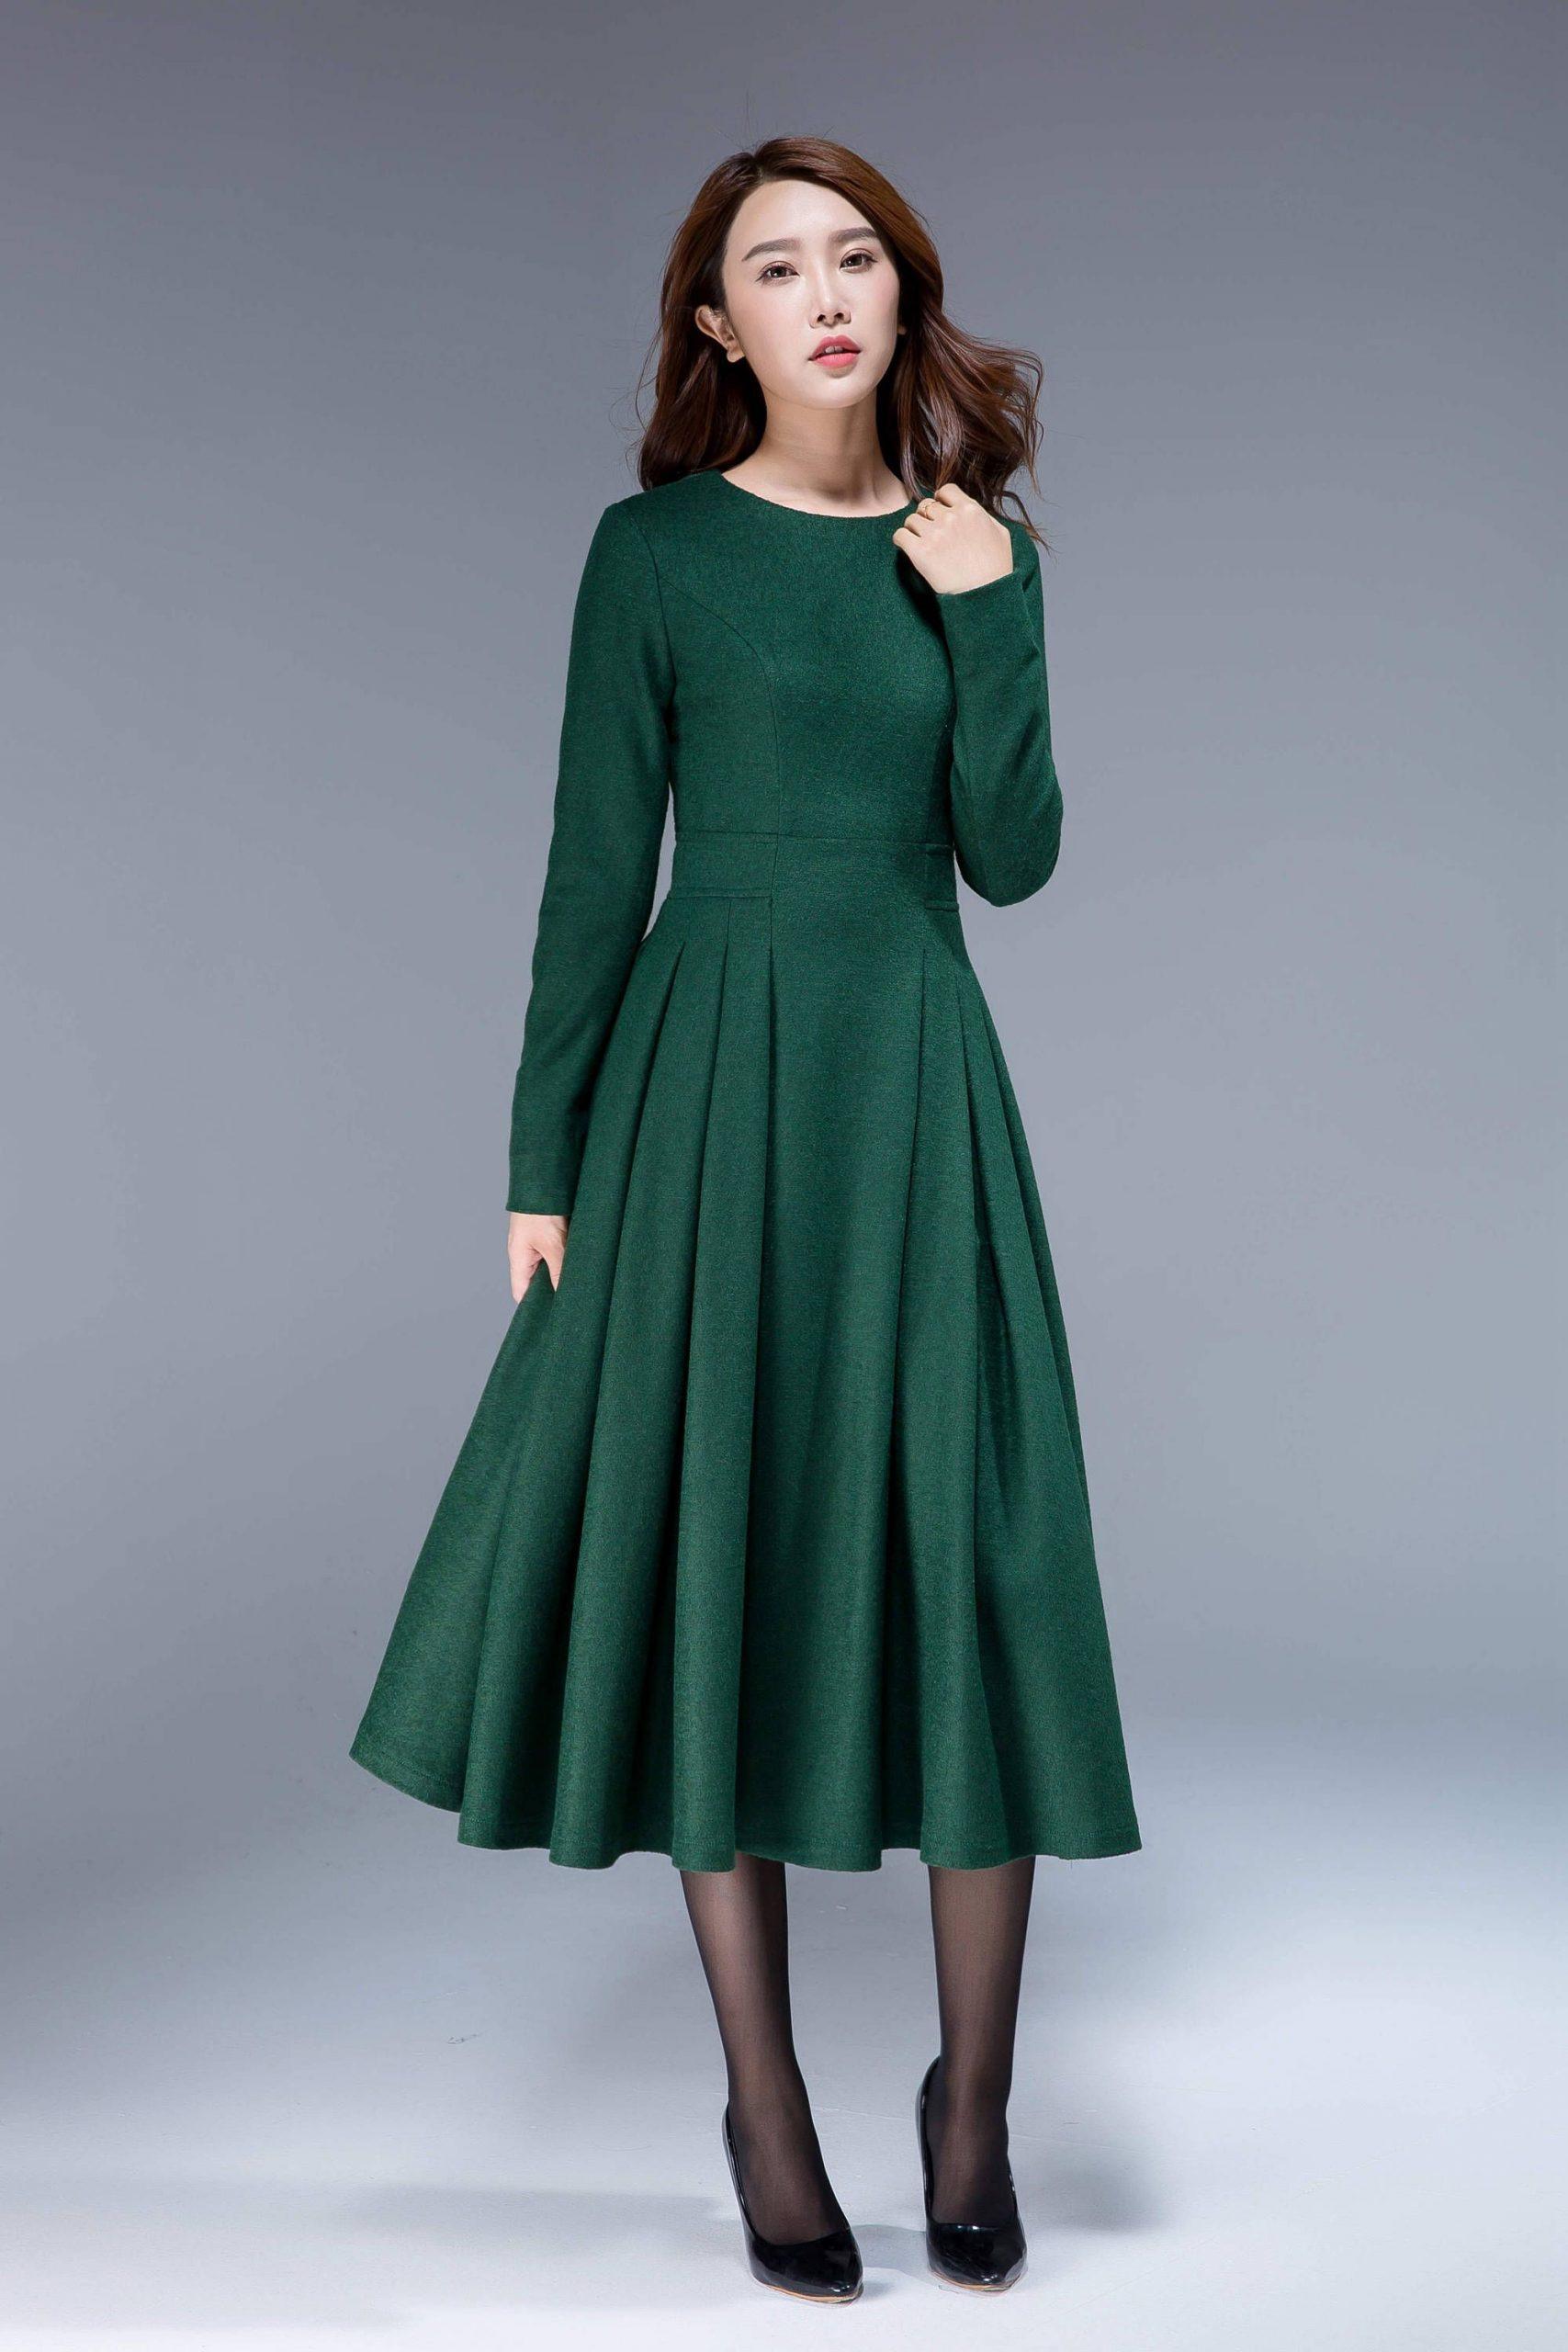 20 Fantastisch Grünes Elegantes Kleid Ärmel20 Luxurius Grünes Elegantes Kleid Boutique